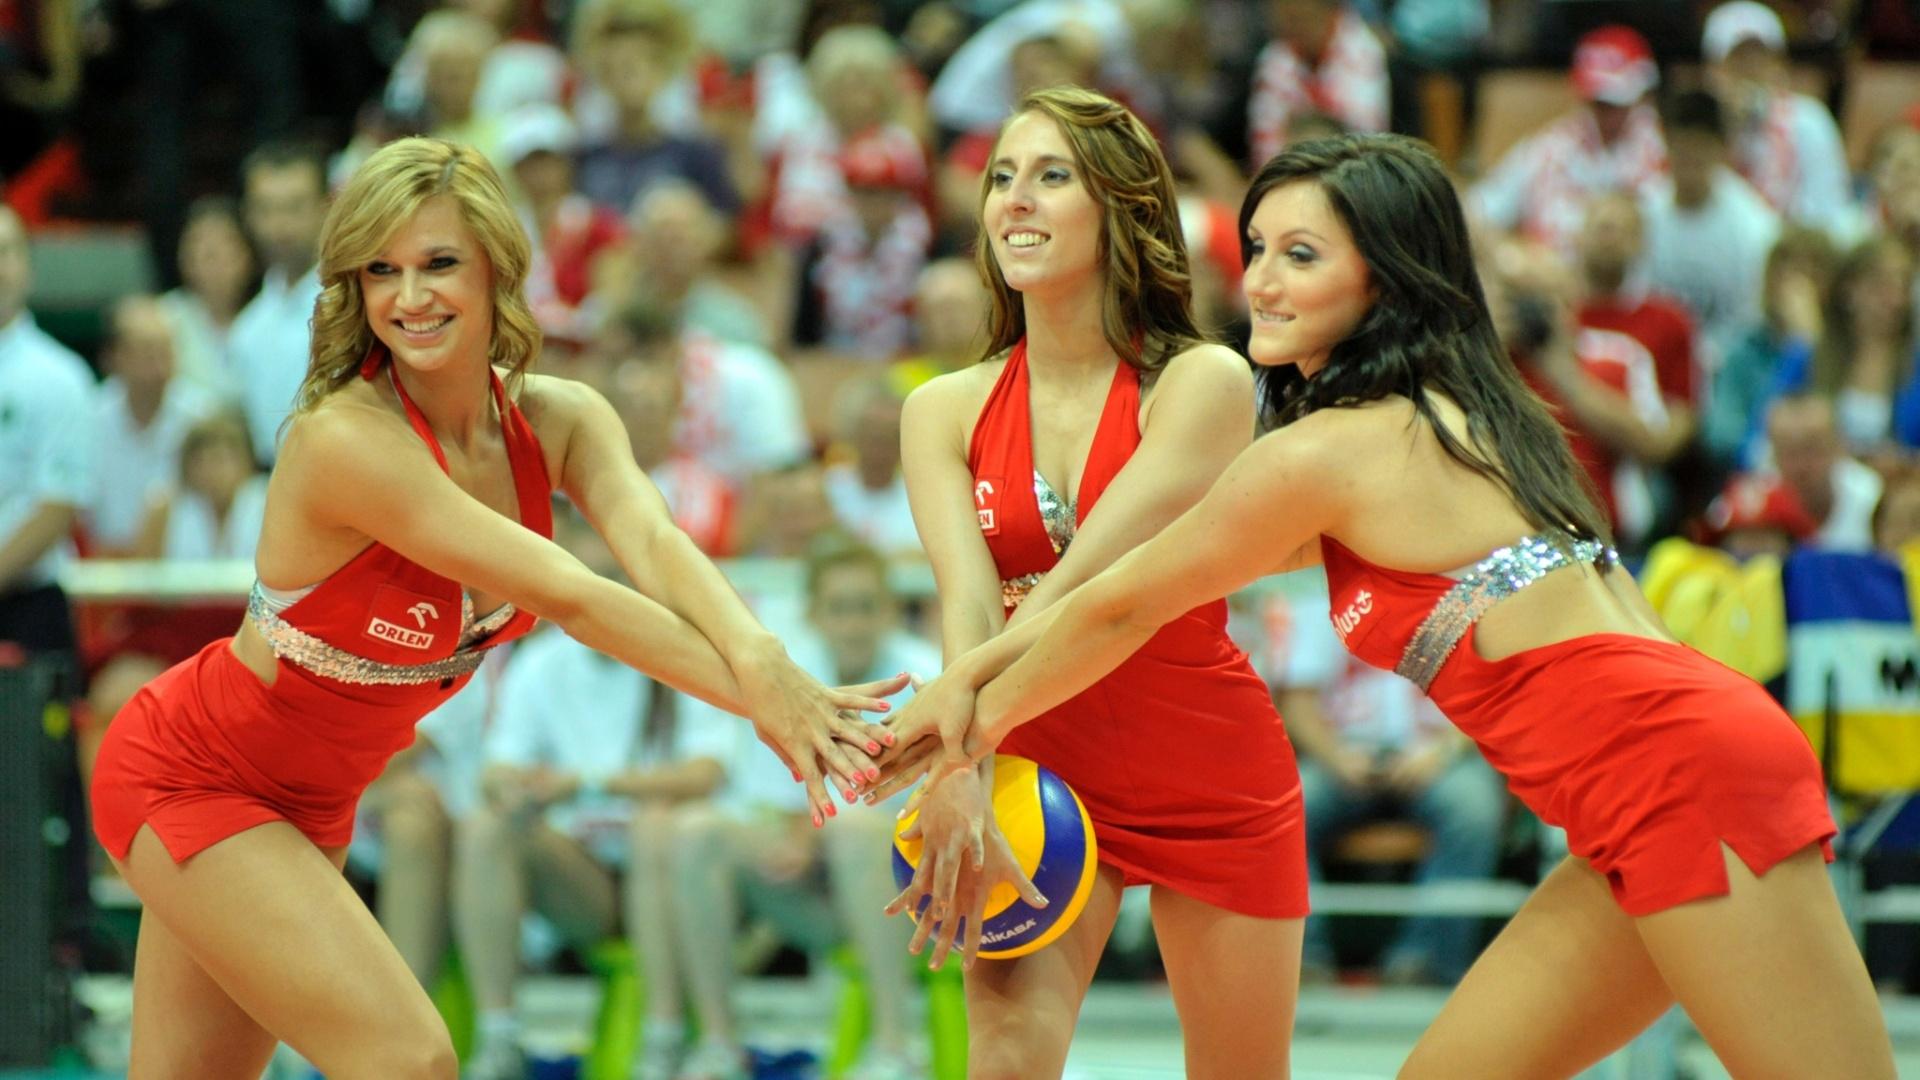 Garotas embelezam intervalo do jogo Brasil x Canadá, na Polônia